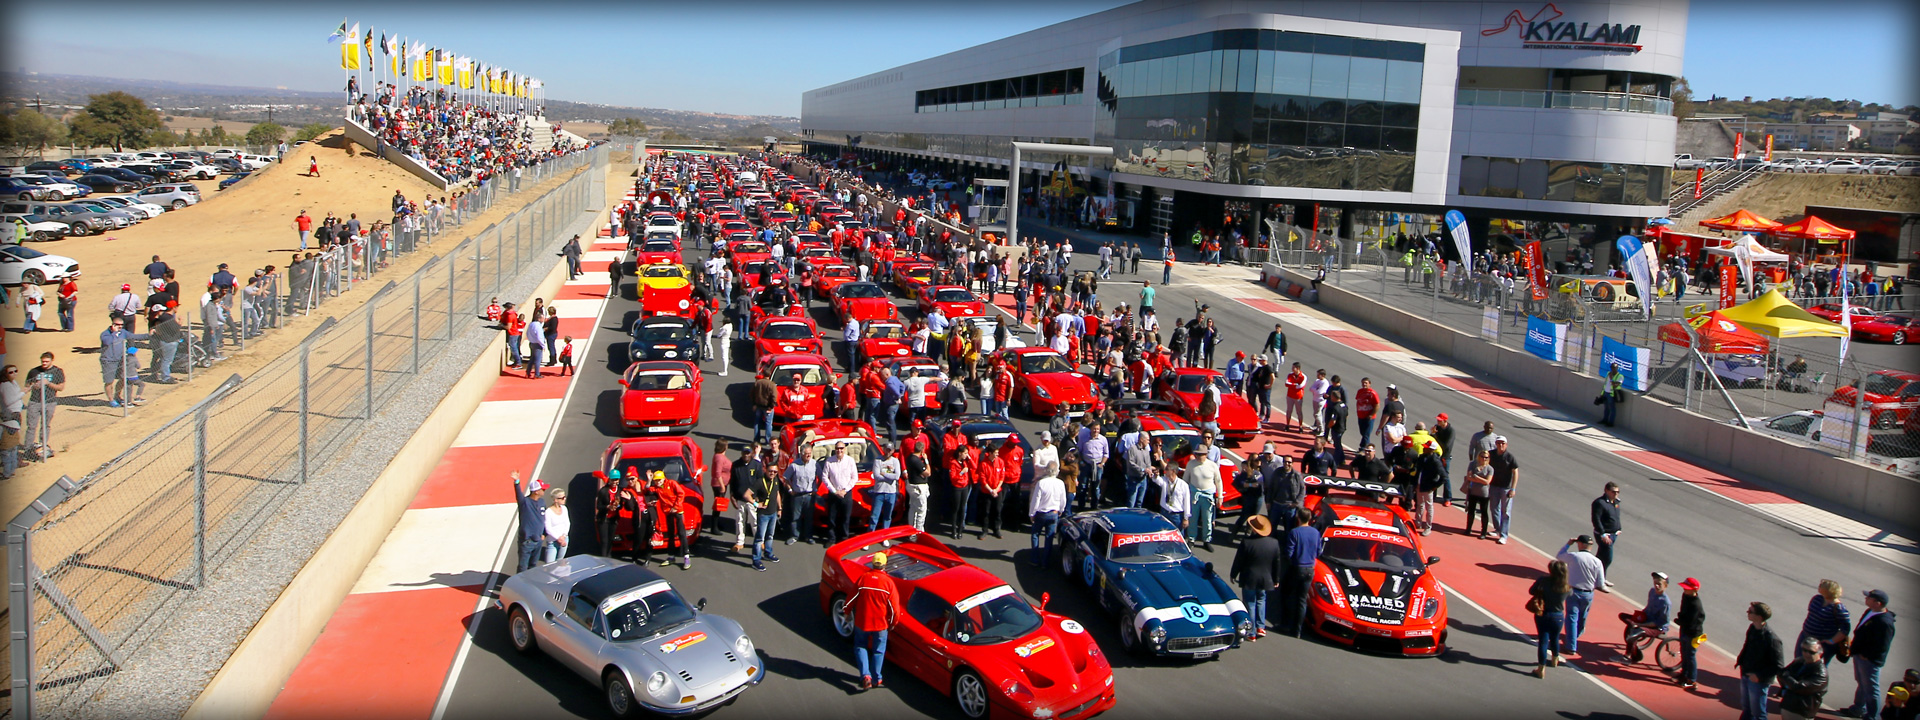 SEFAC / Ferrari Track Day - 2016